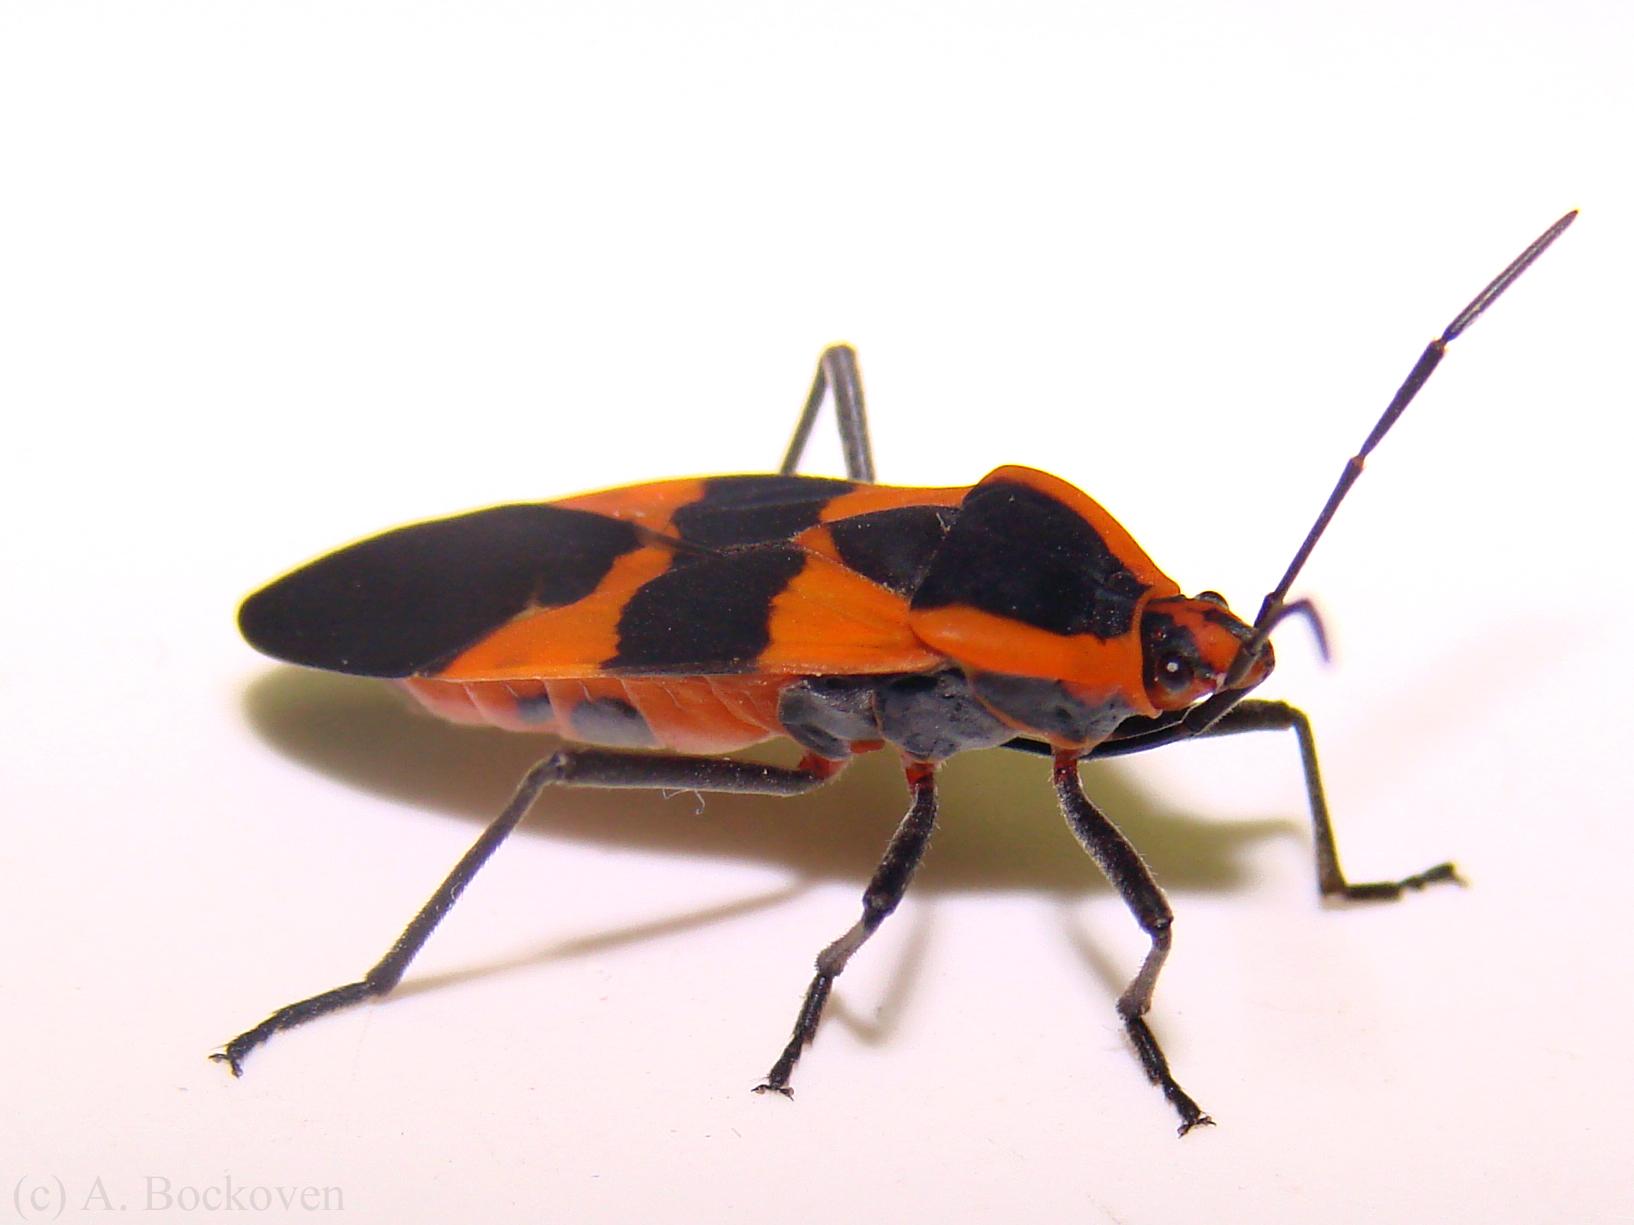 True bugs clipart #12